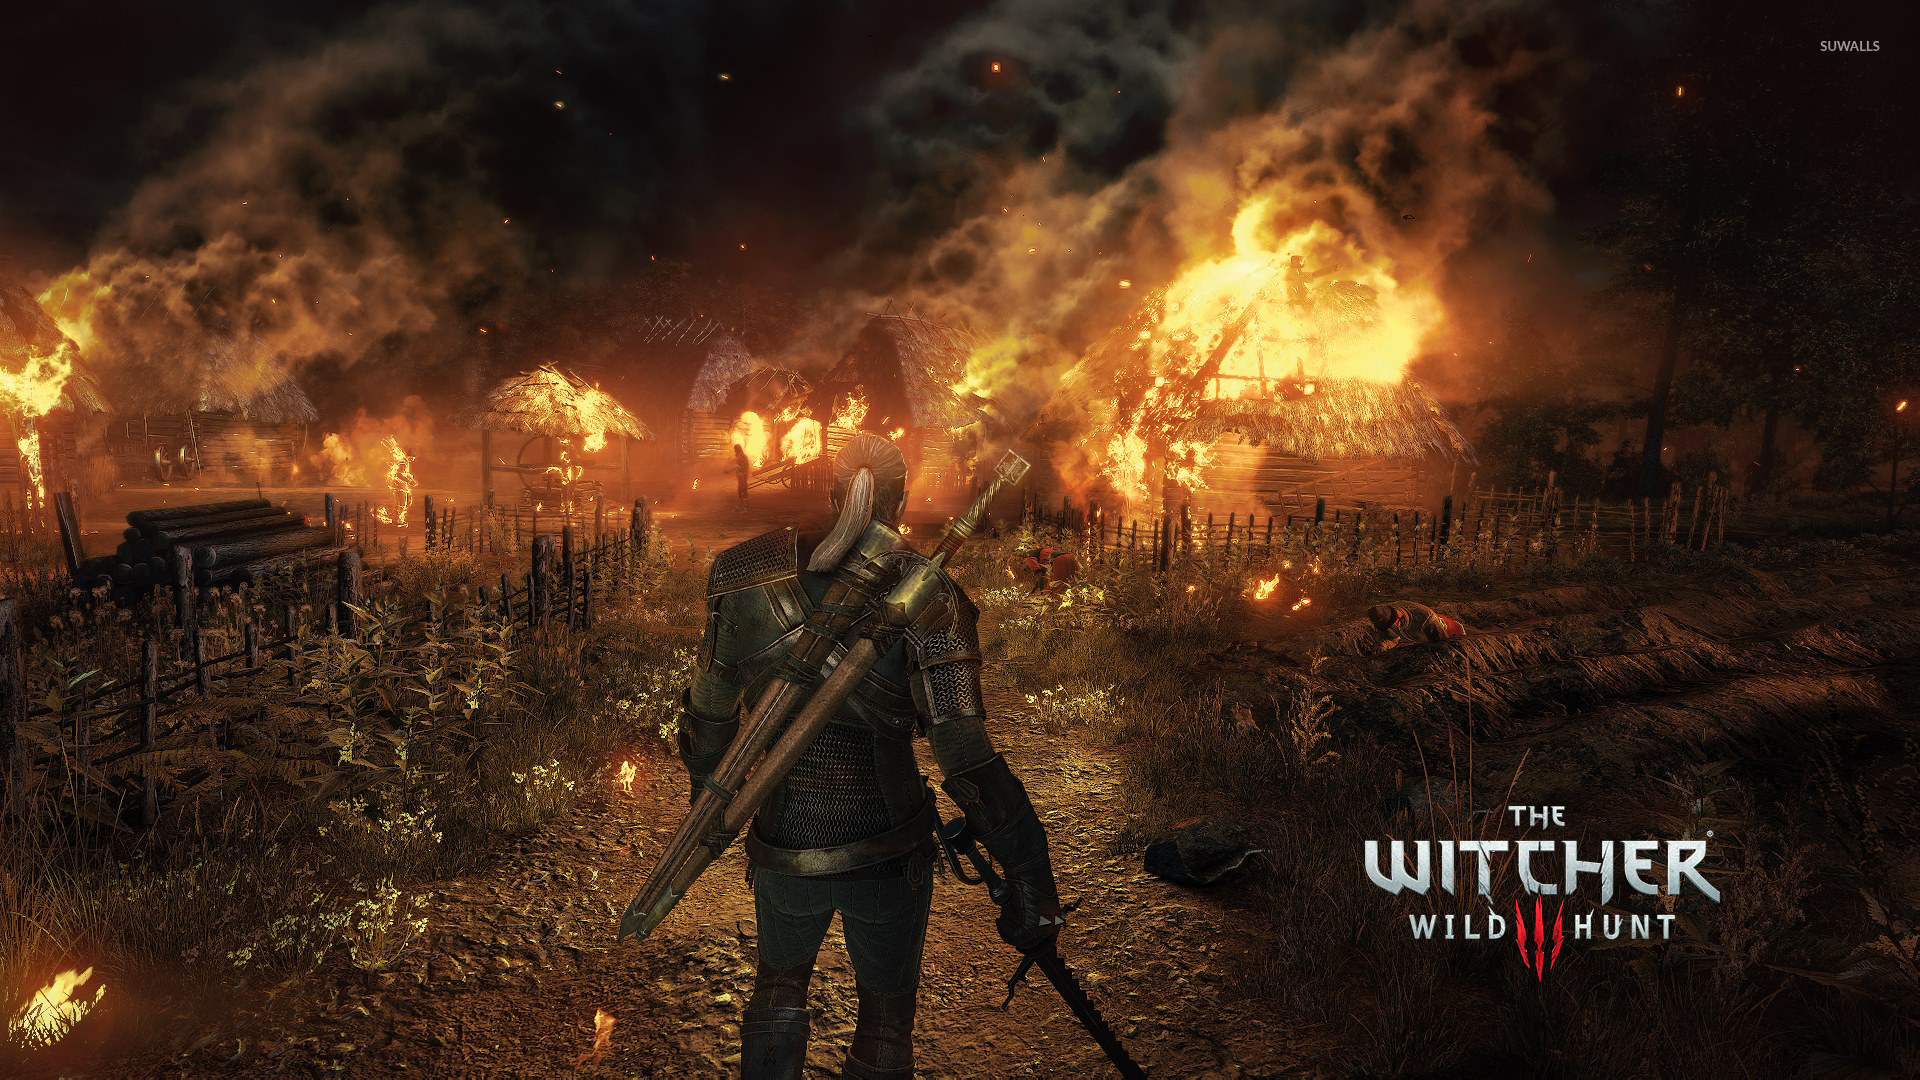 geralt in the burning village the witcher 3 wild hunt